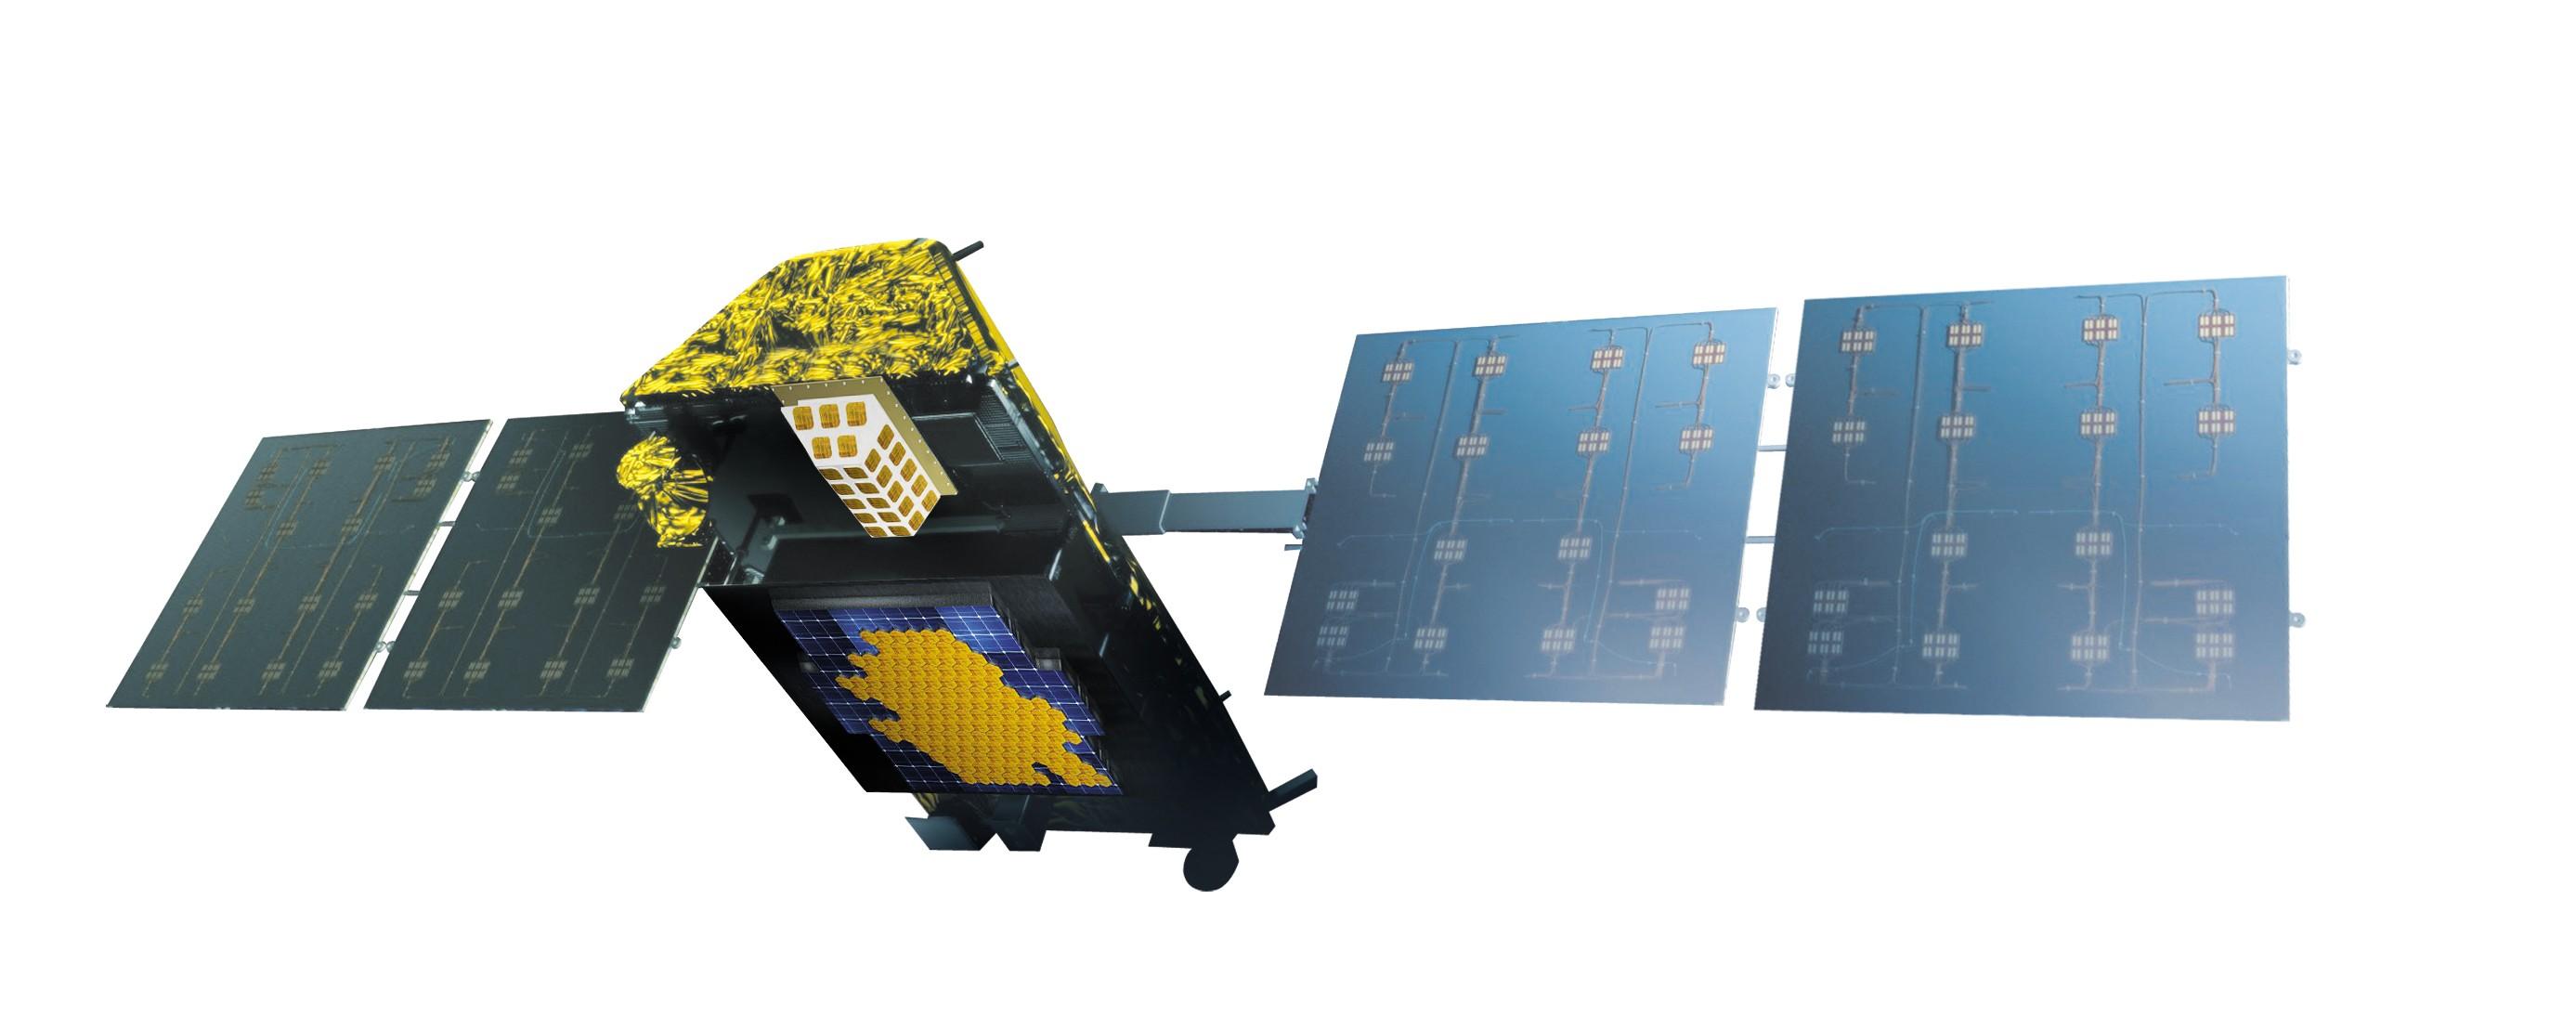 thales Iridium Next satellite